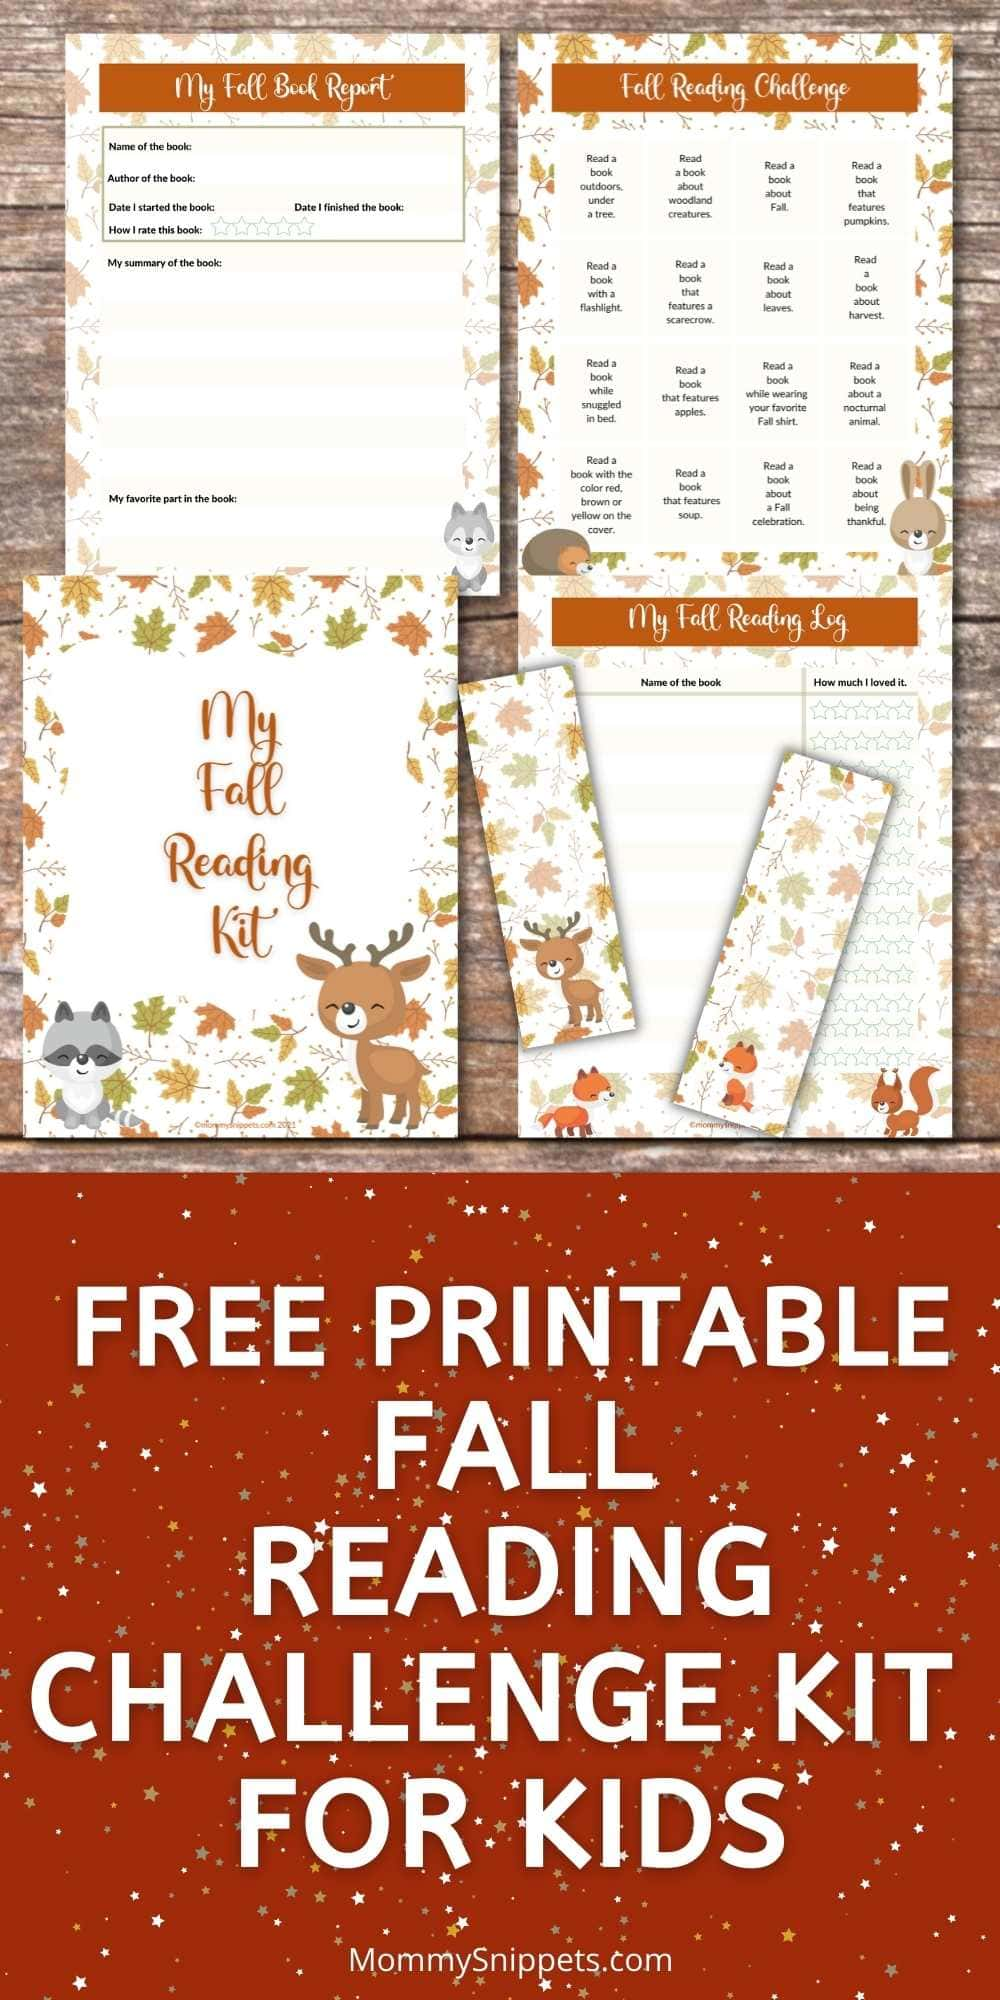 Make Fall Reading Fun- Free Printable Reading Challenge for Kids